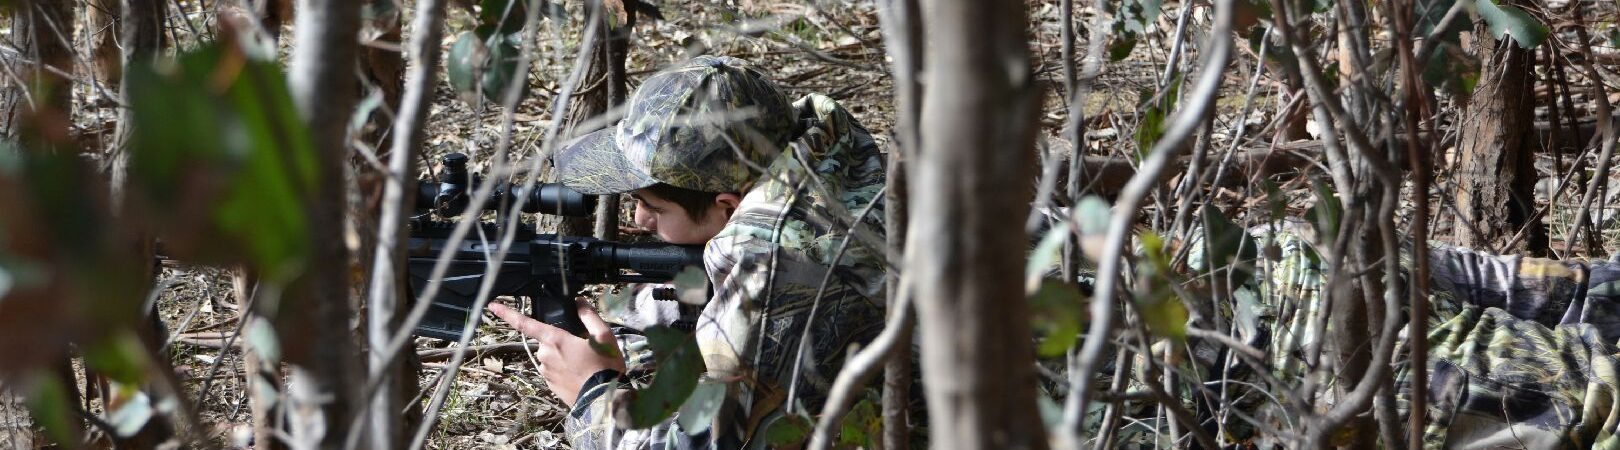 Austealth Australian Camo - Hunting in the Australian bush.